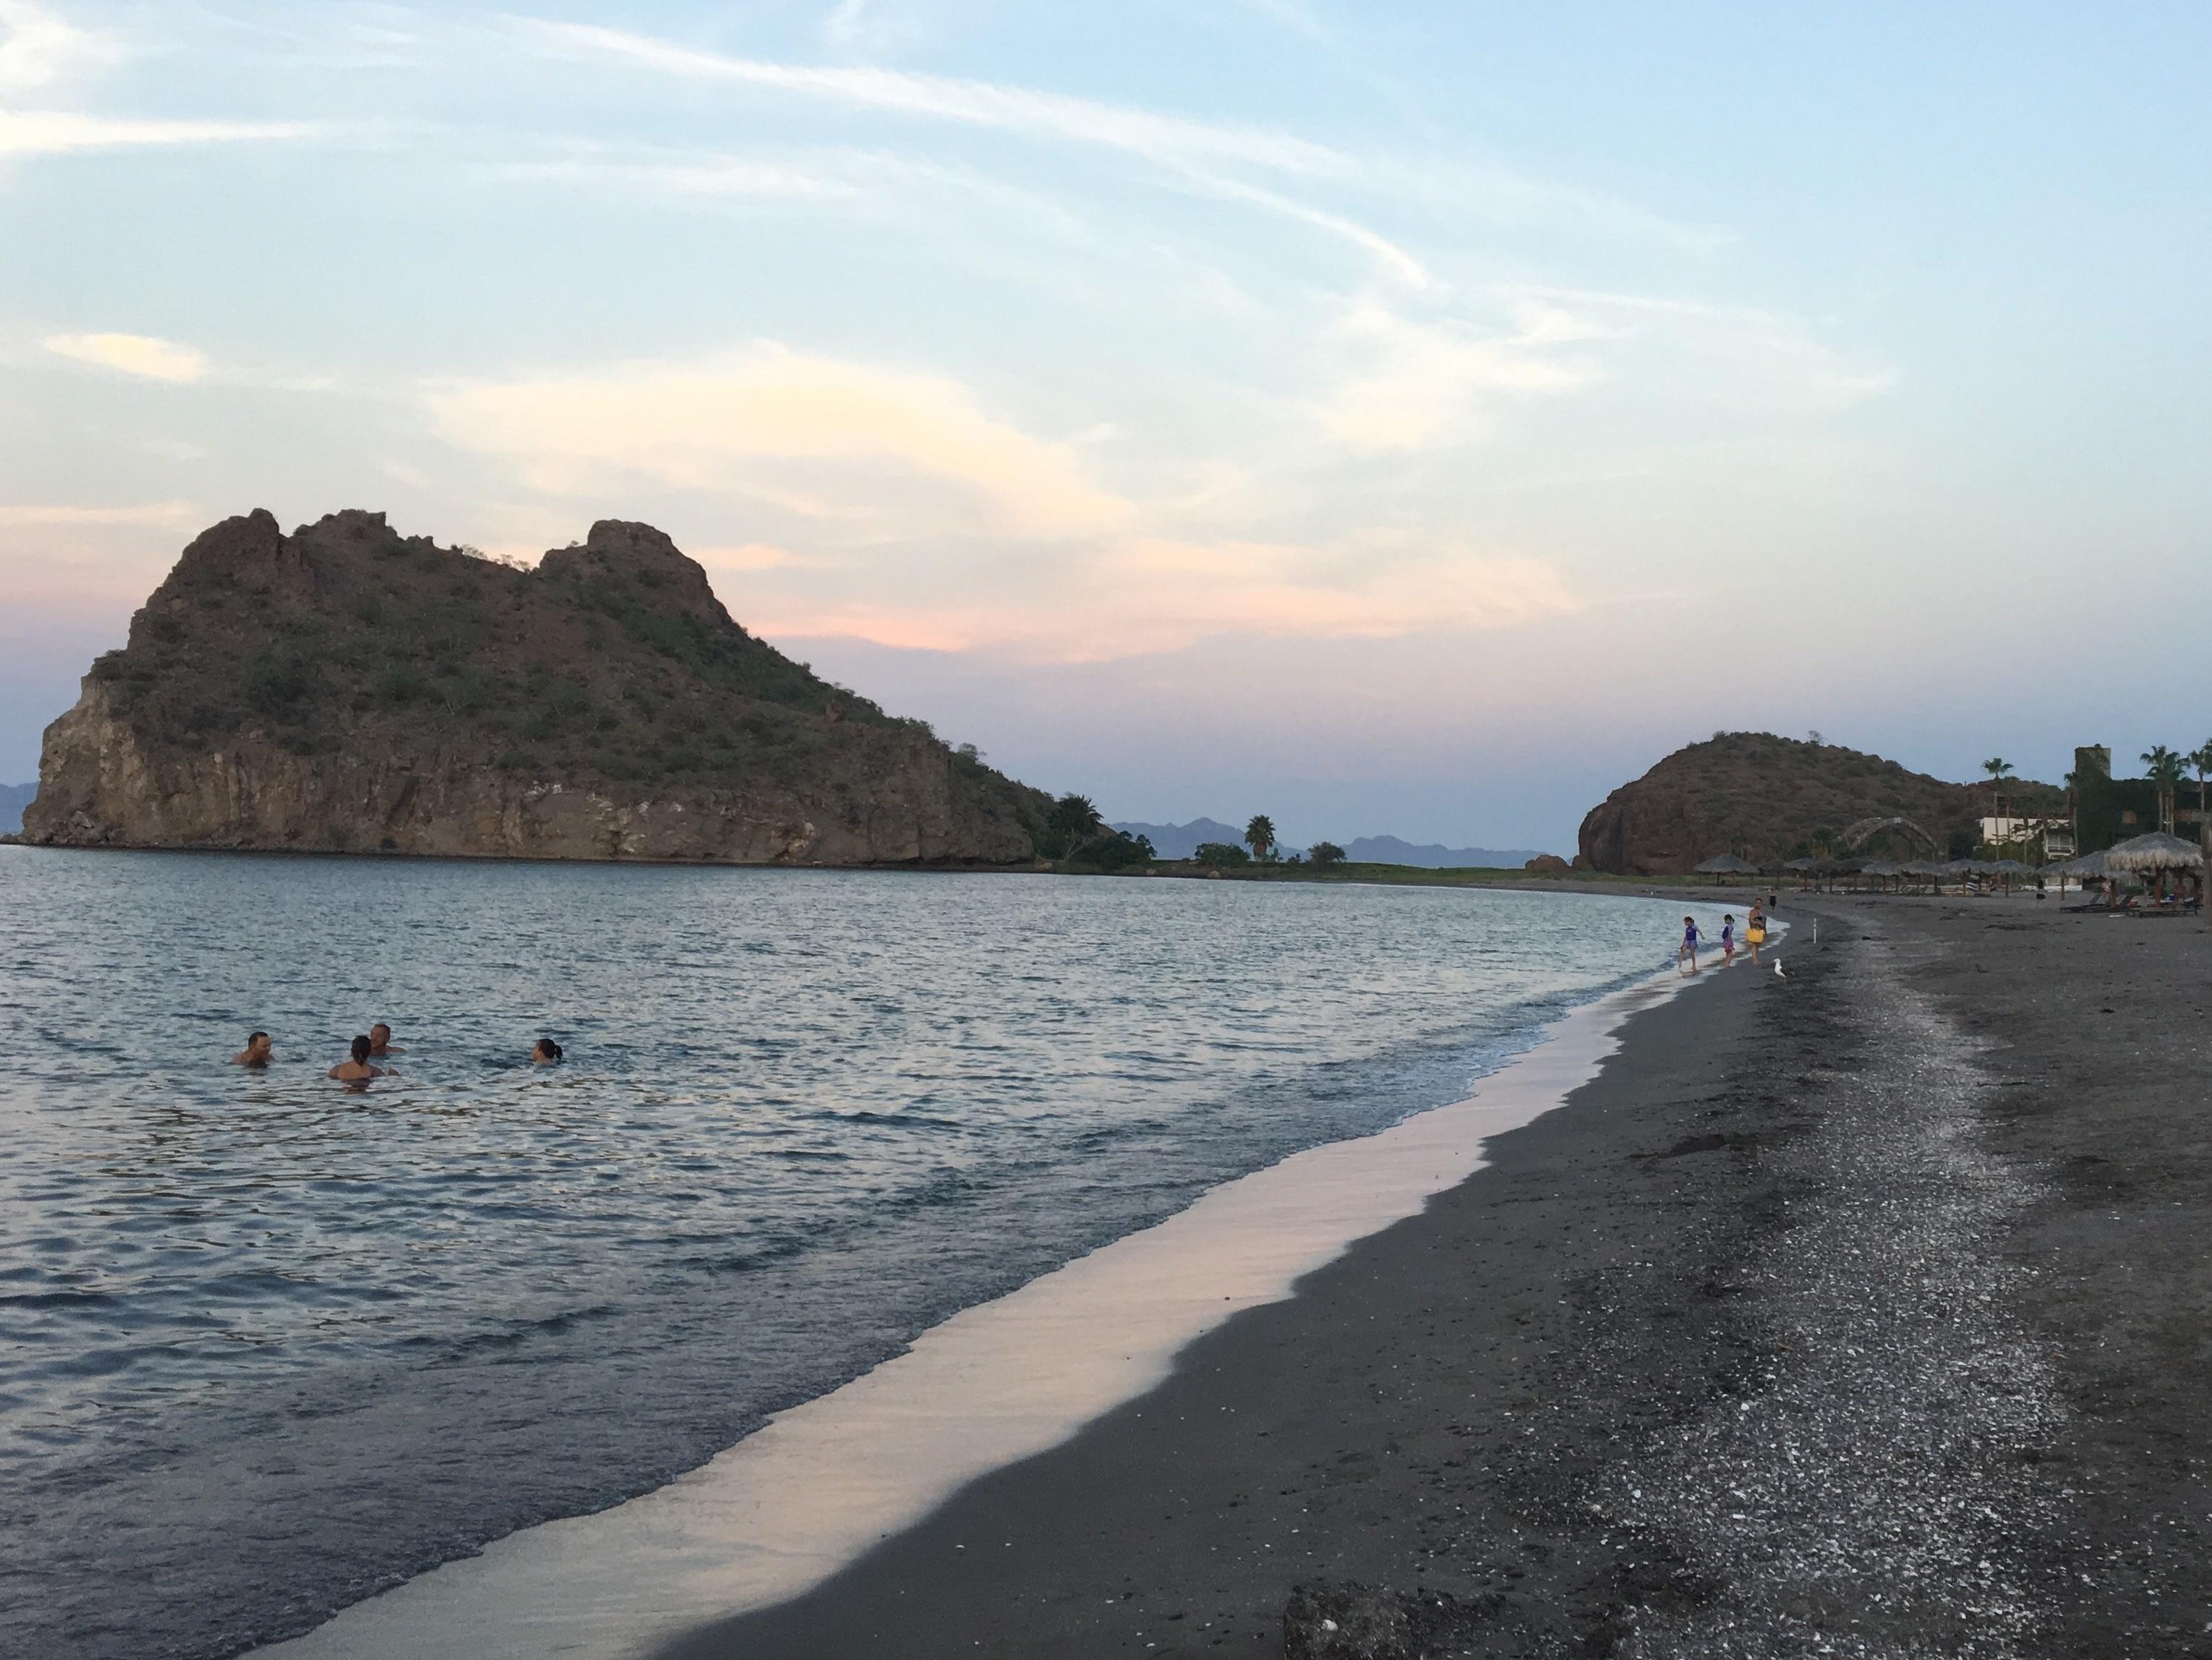 Nopolo, Loreto, Baja California Sur, Mexico